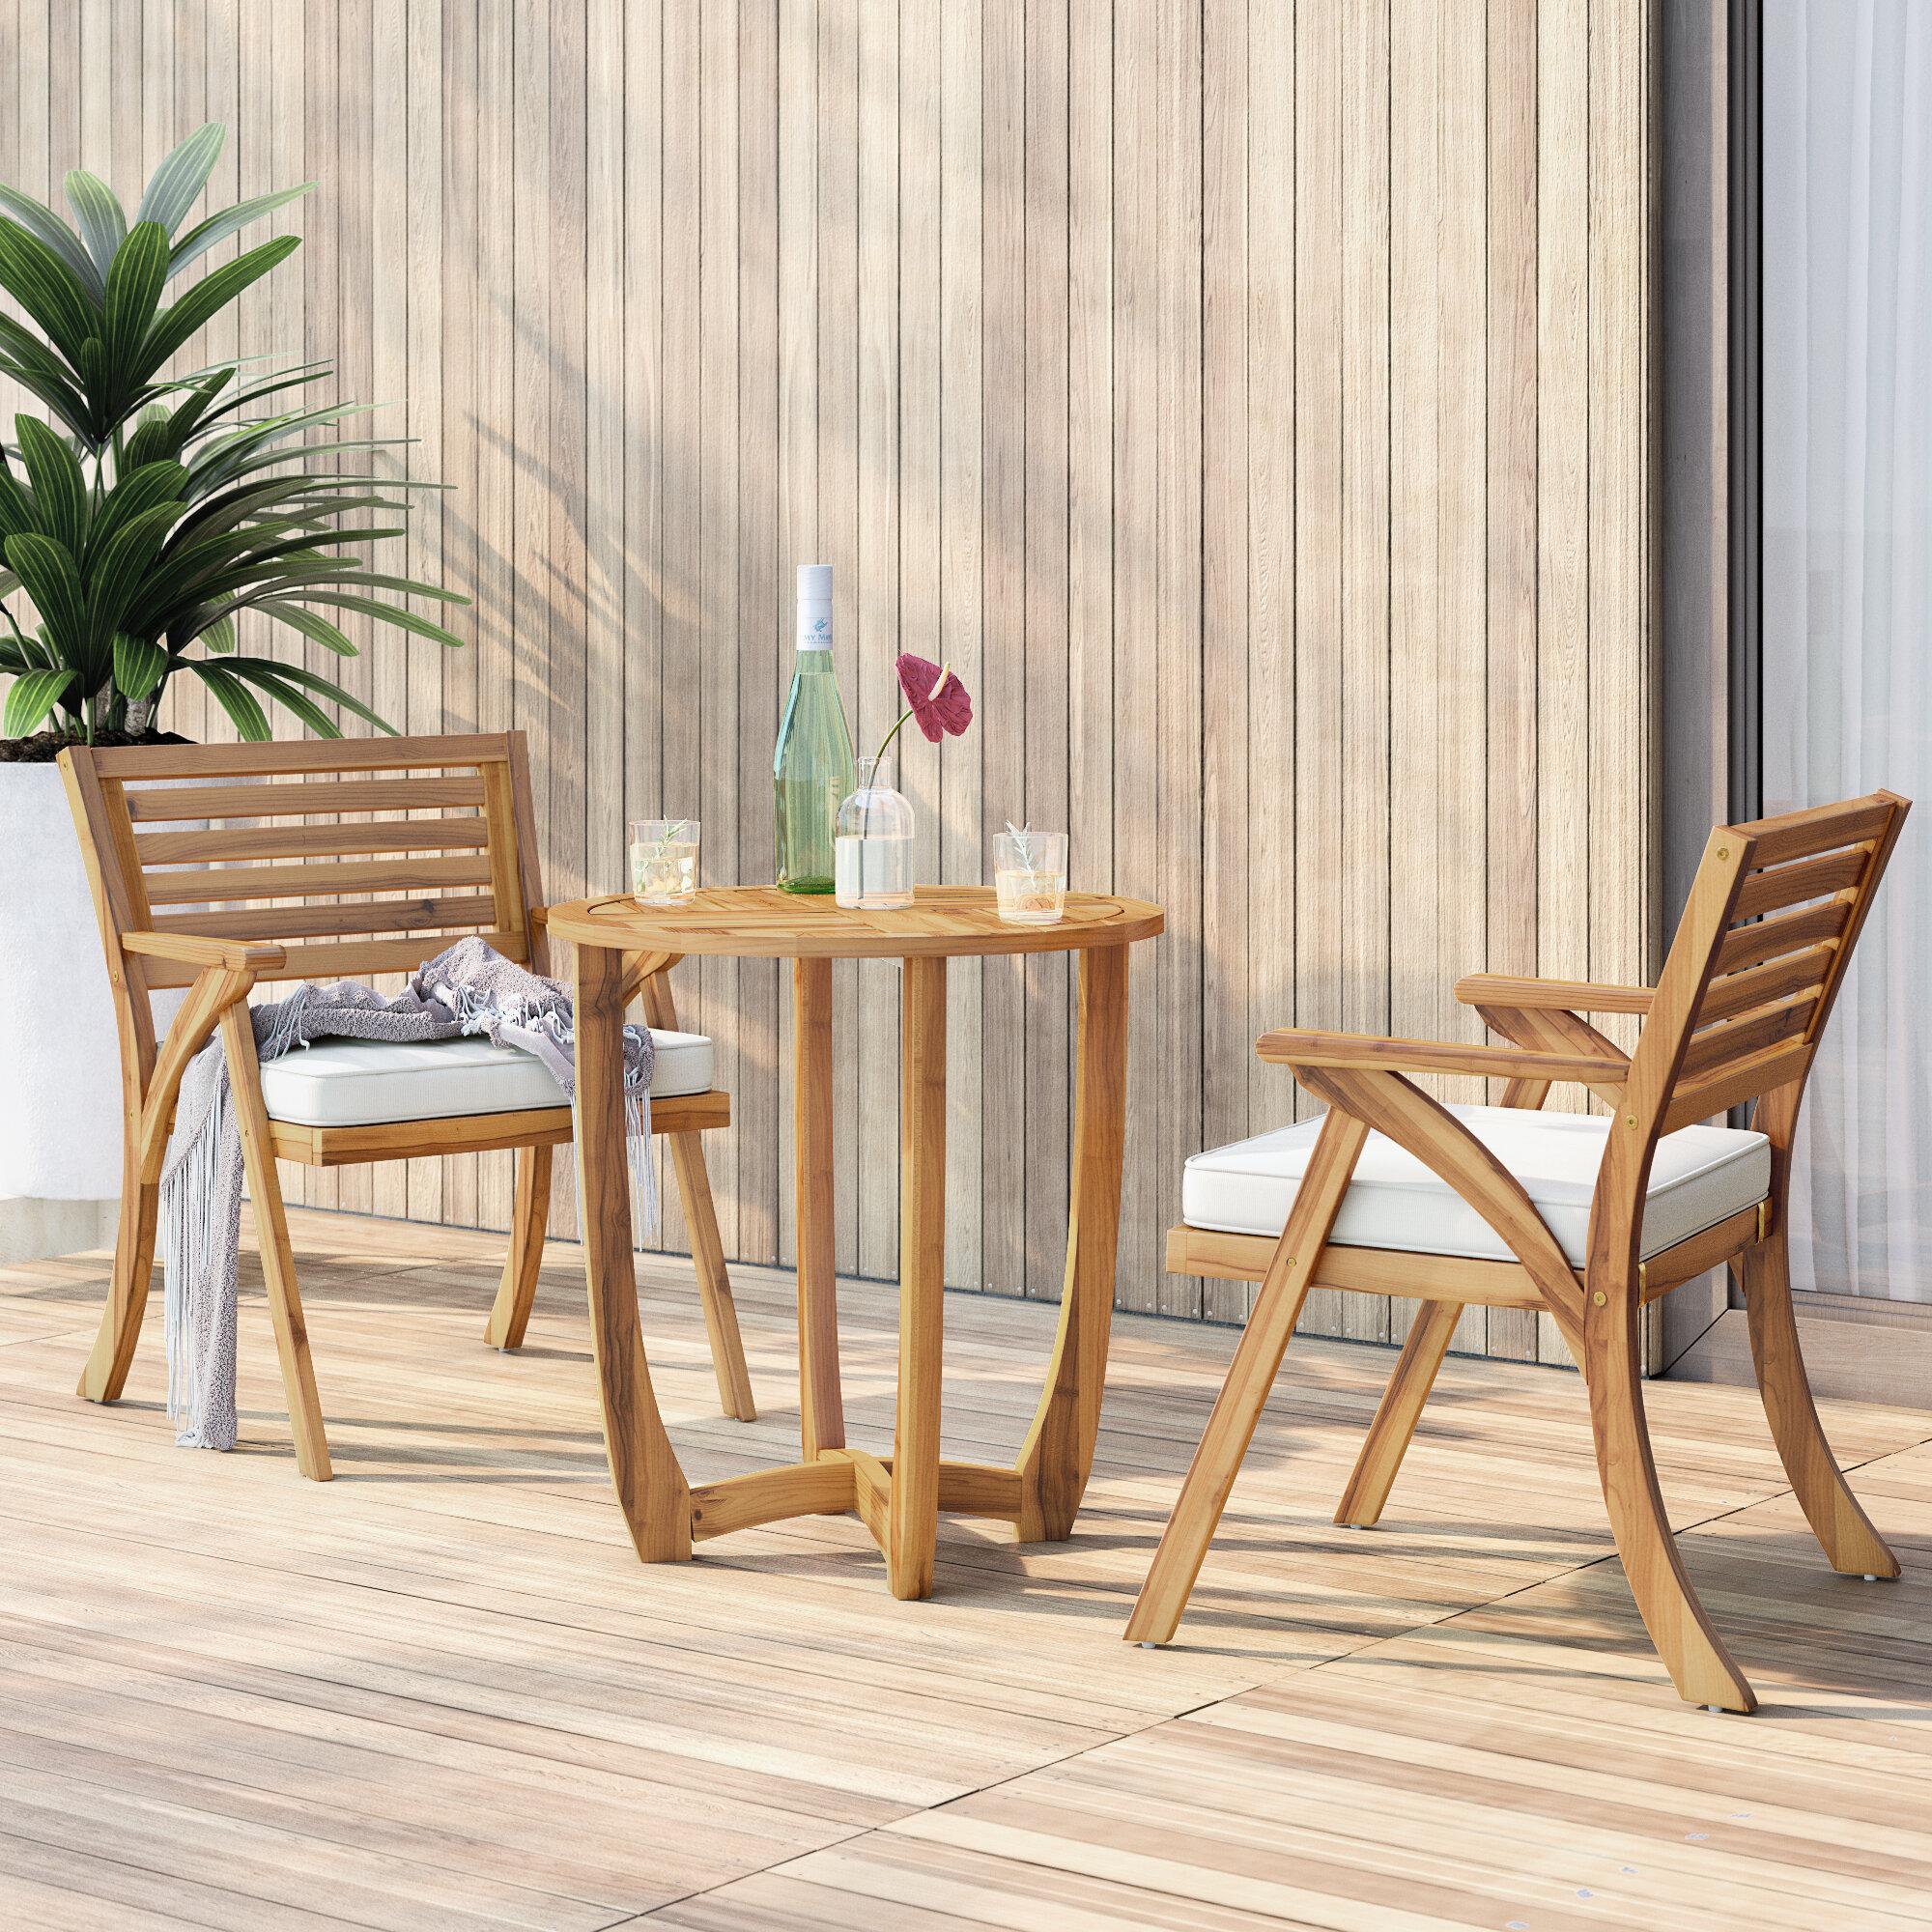 Outdoor Teak Furniture In America Youtube